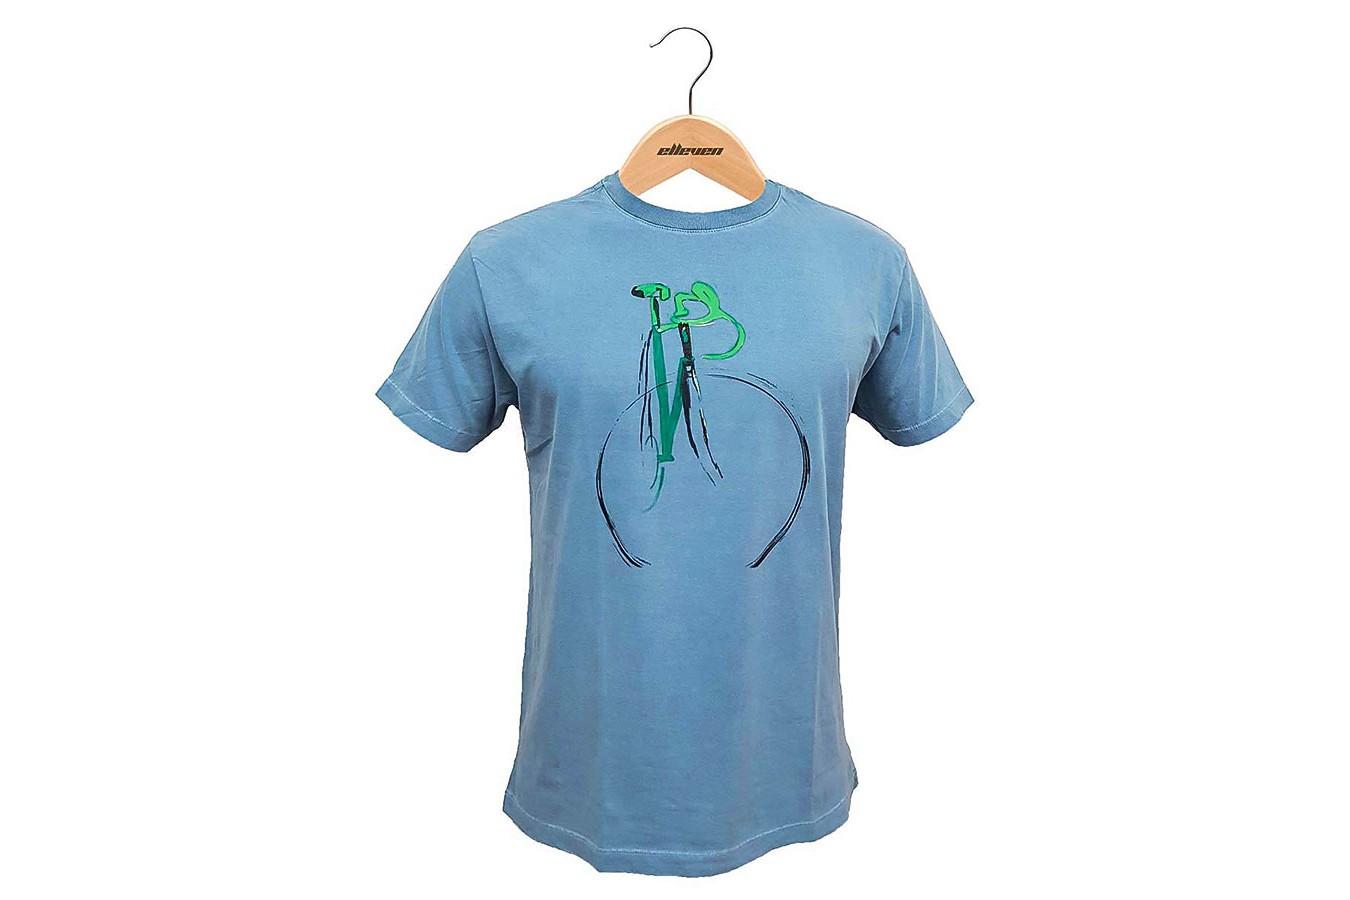 Camiseta Casual Pintura Azul Celeste - Elleven